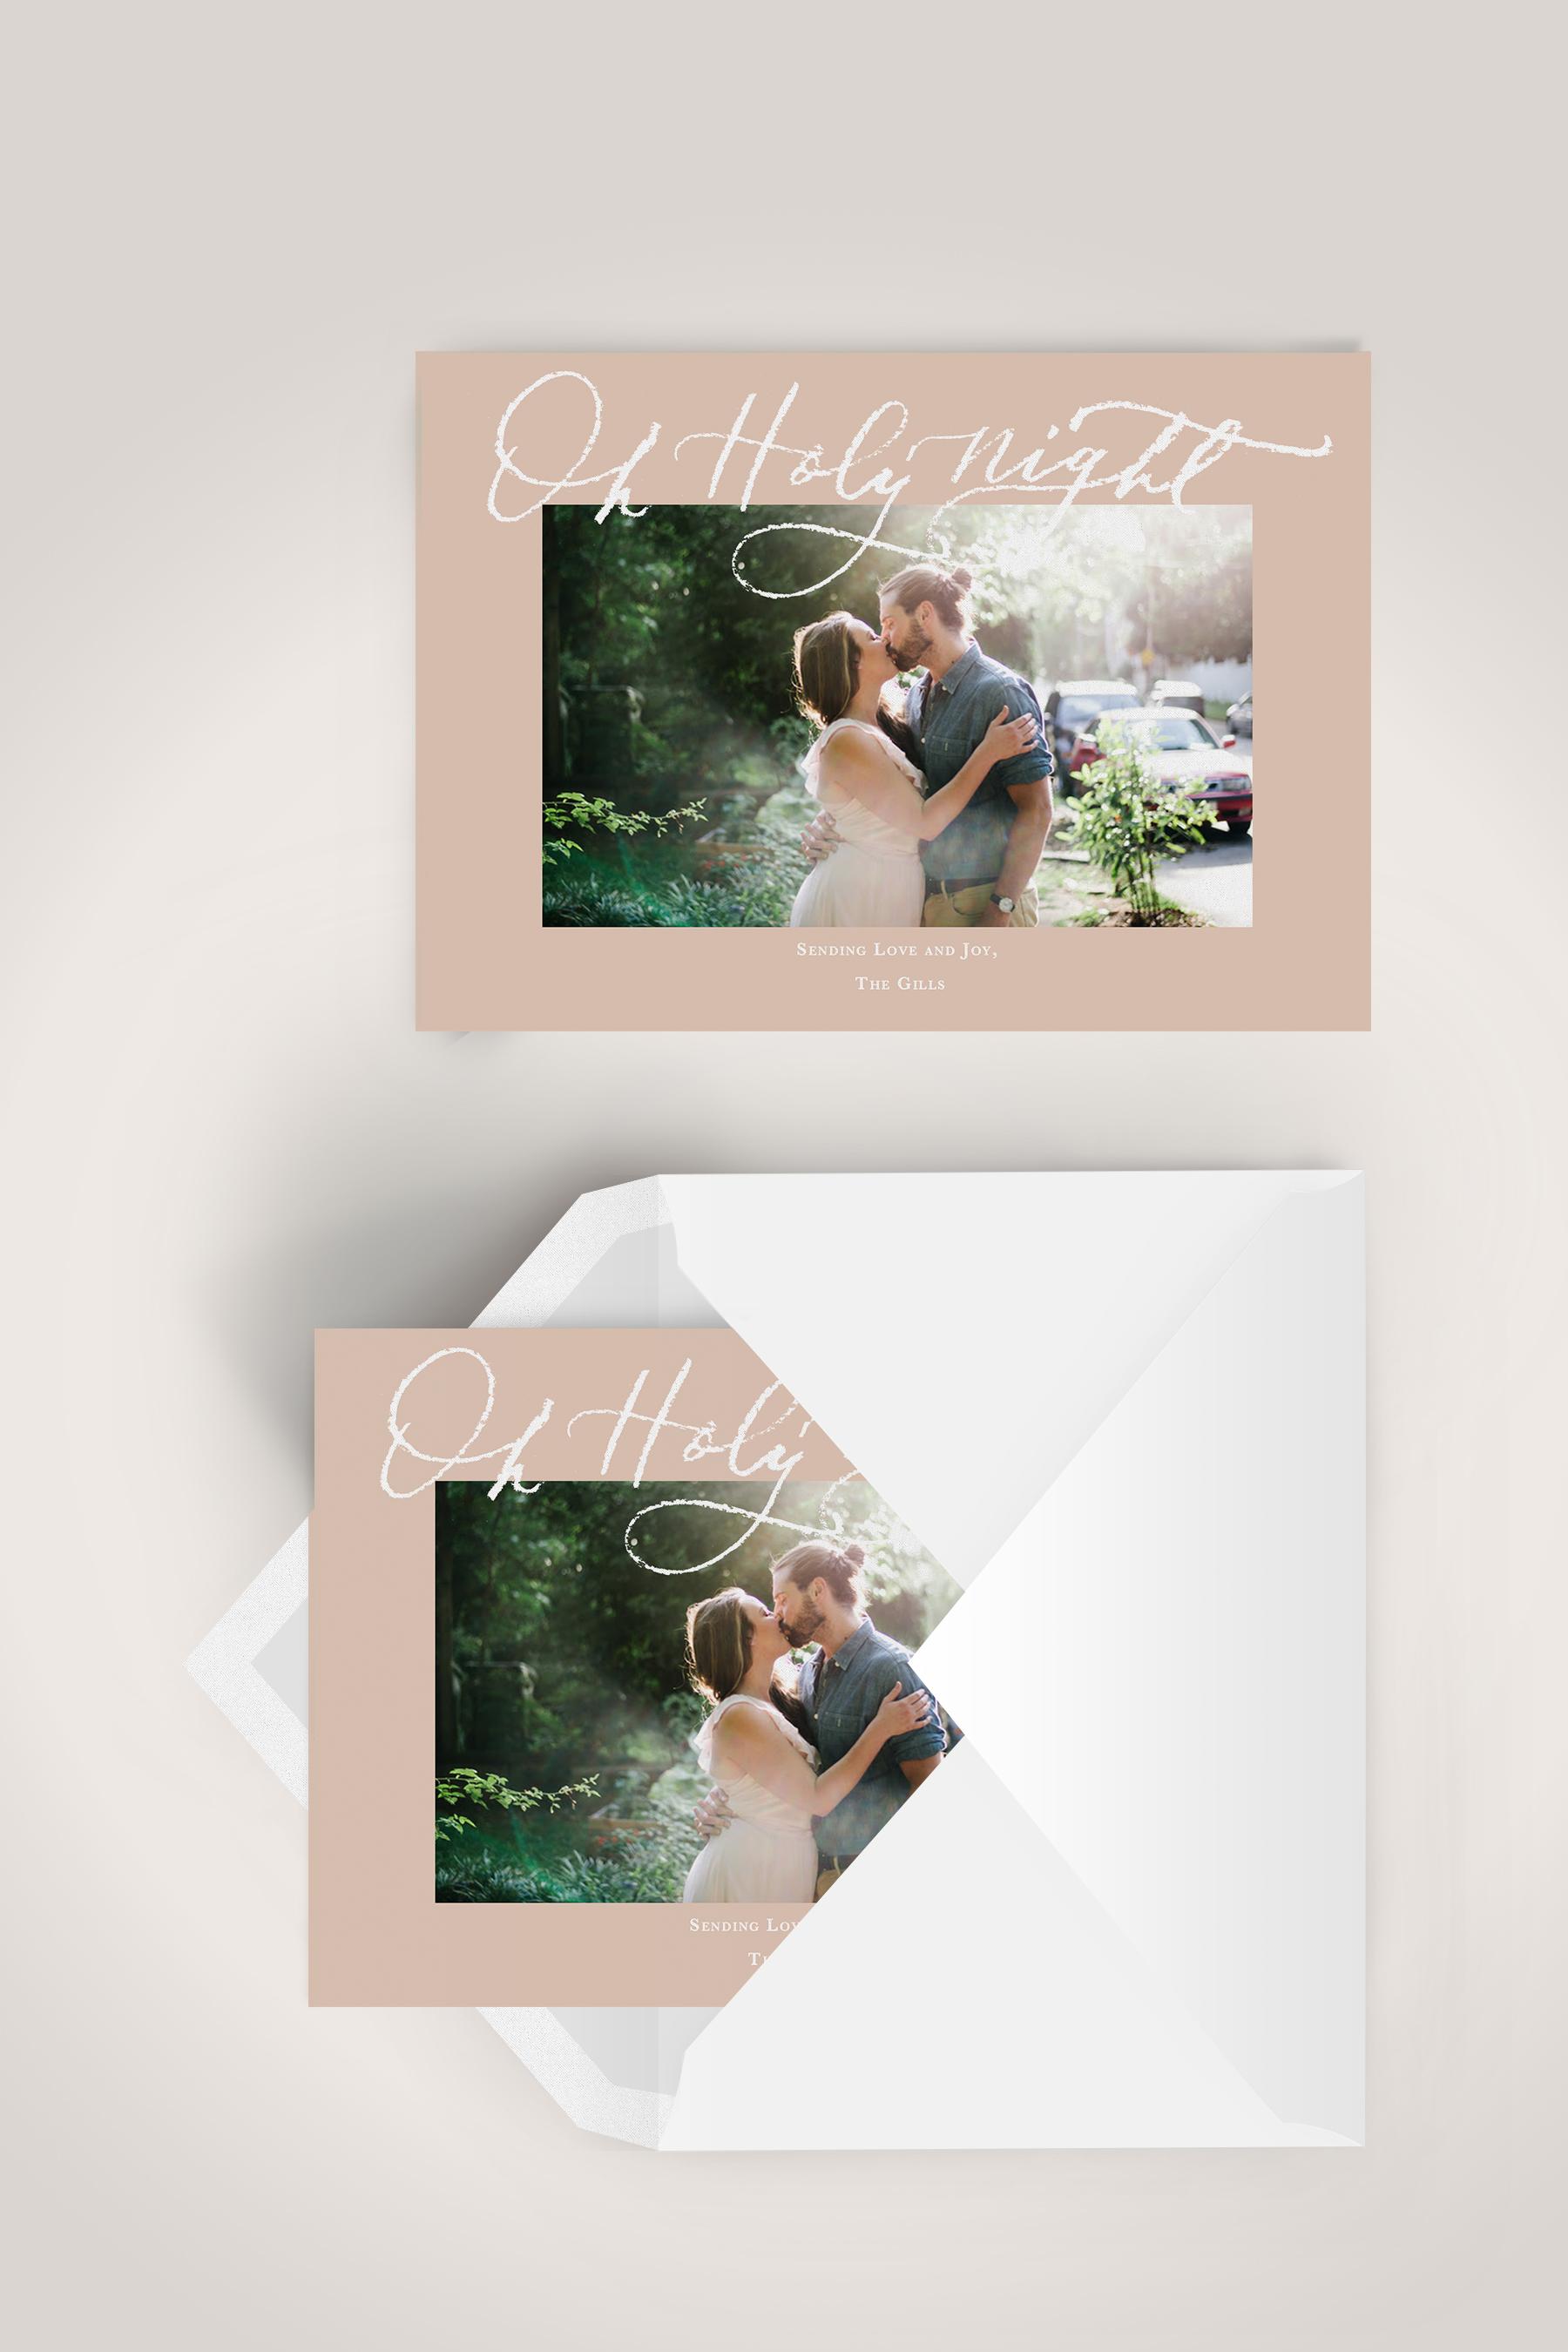 Blush and White Calligraphy Christmas Card | Custom Luxury Wedding | Lauren Antoniaa Calligraphy and Design